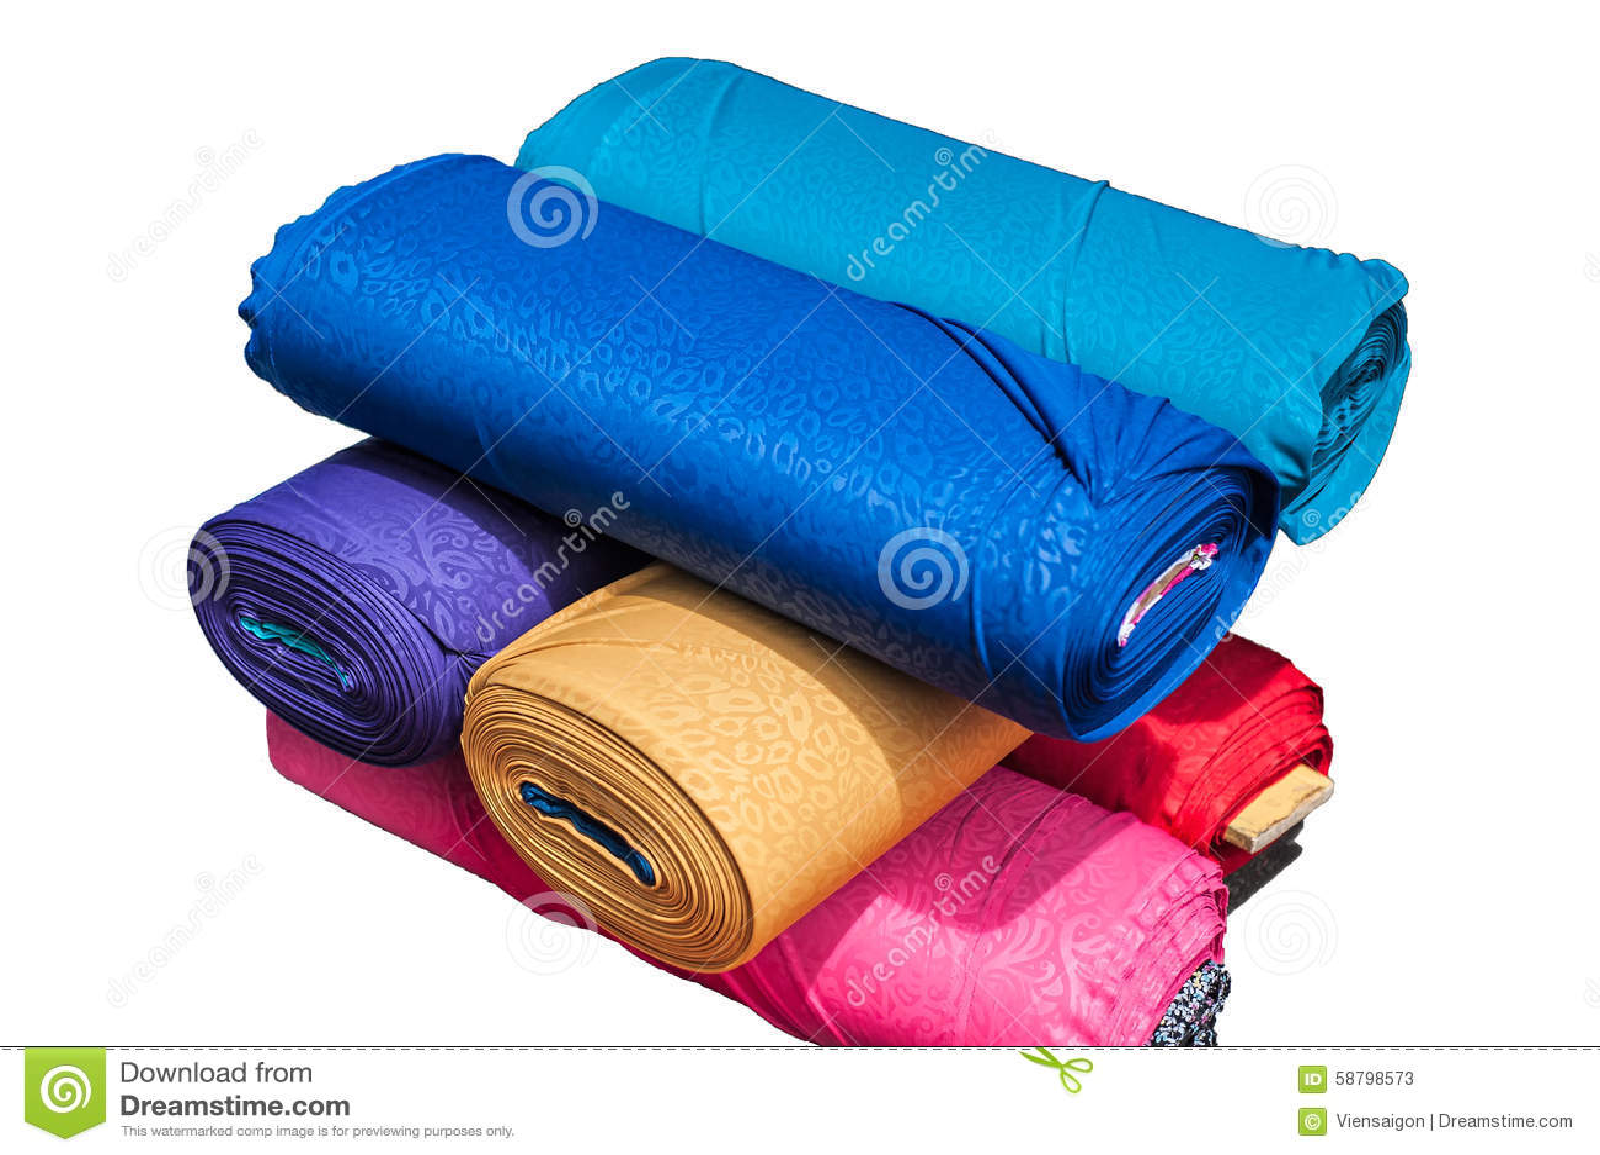 The cloth rolls